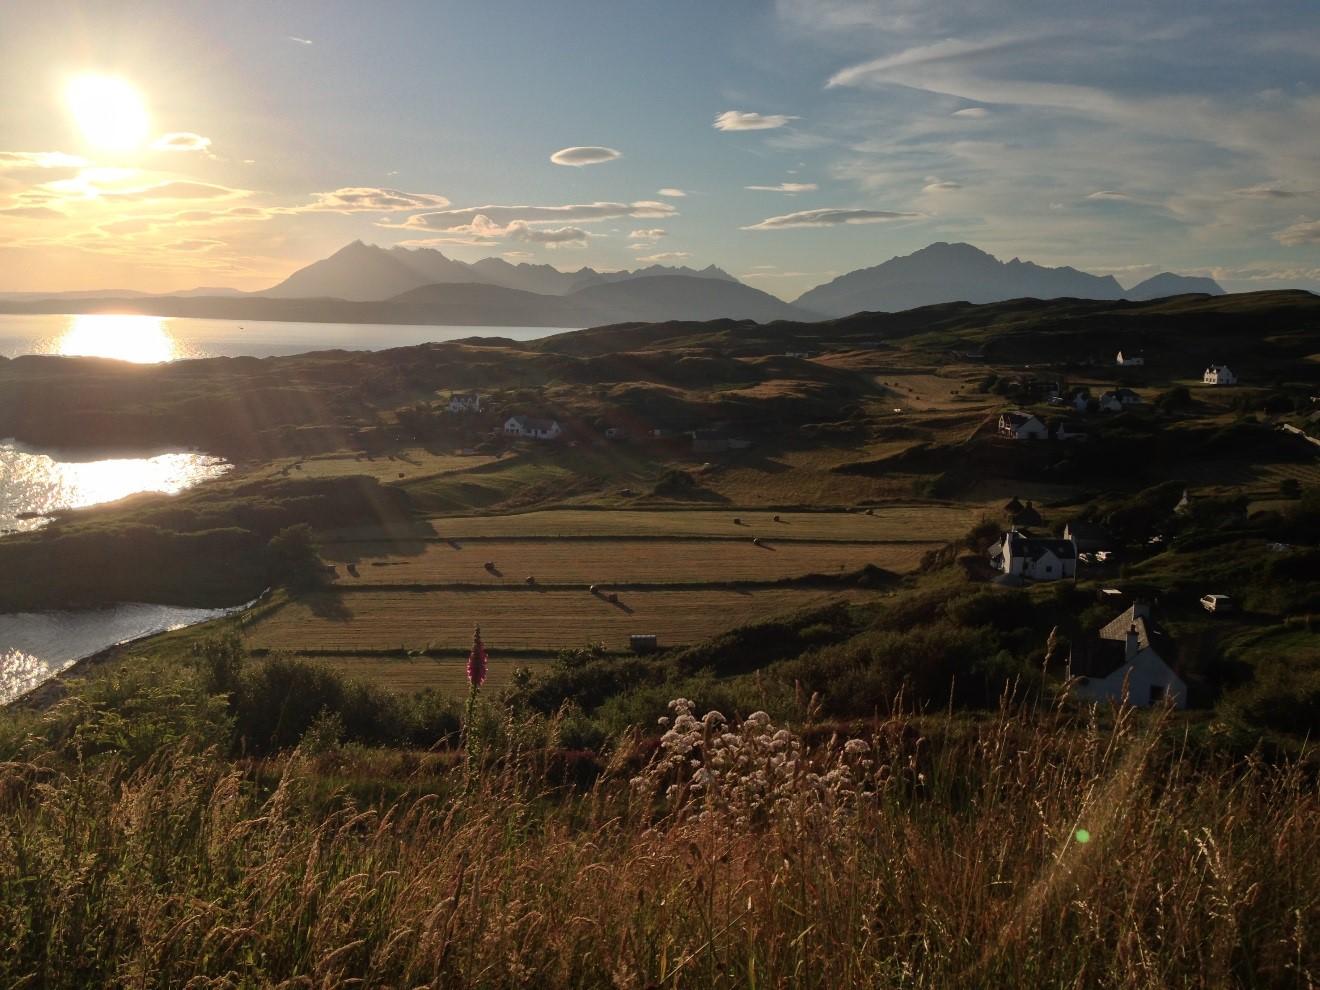 Farming landscape in a summer evening